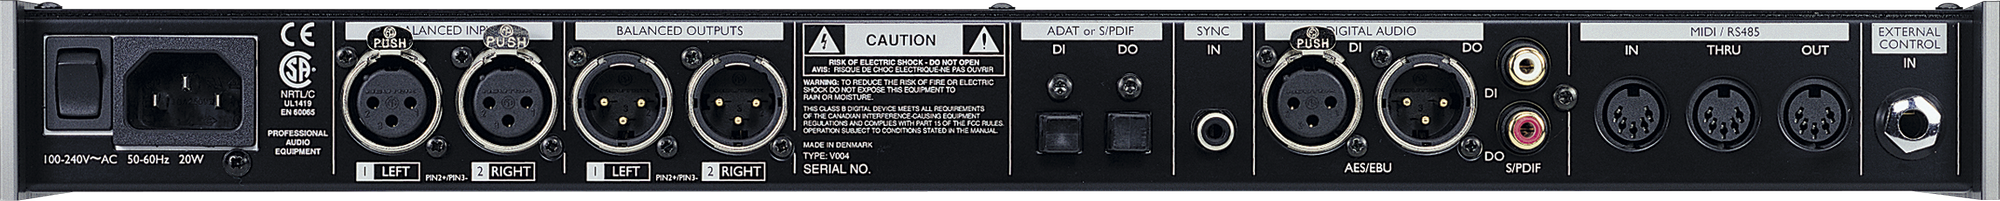 TC-Electronic M3000 Studio Reverb Processor